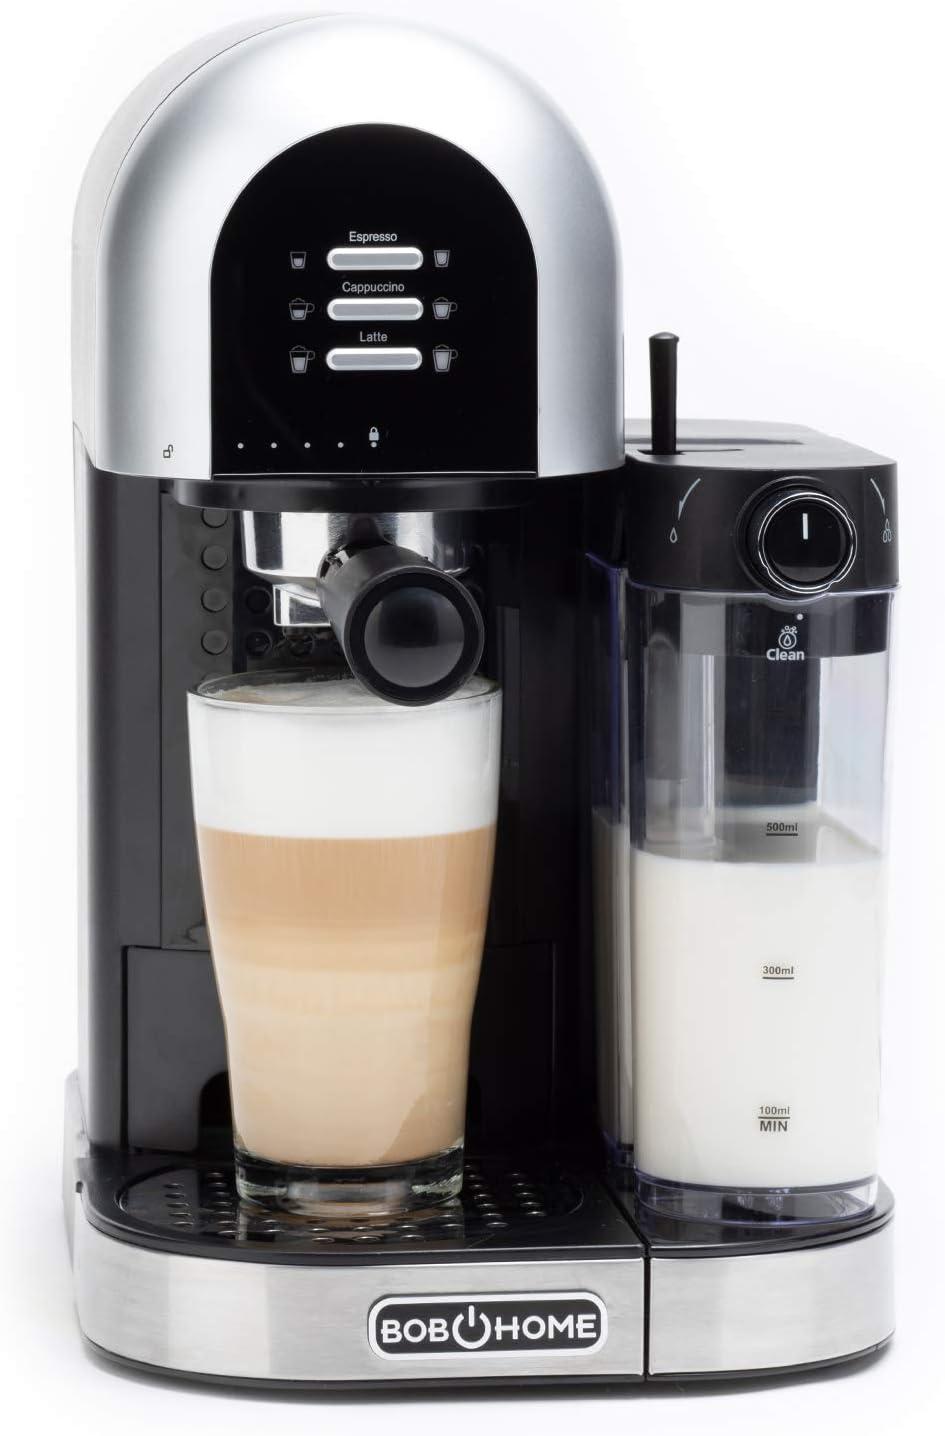 BOB HOME LATTESSA - Cafetera de goteo (15 bares, automática, depósito de leche extraíble, programa de limpieza, especialidades preprogramadas, altura de taza ajustable): Amazon.es: Hogar